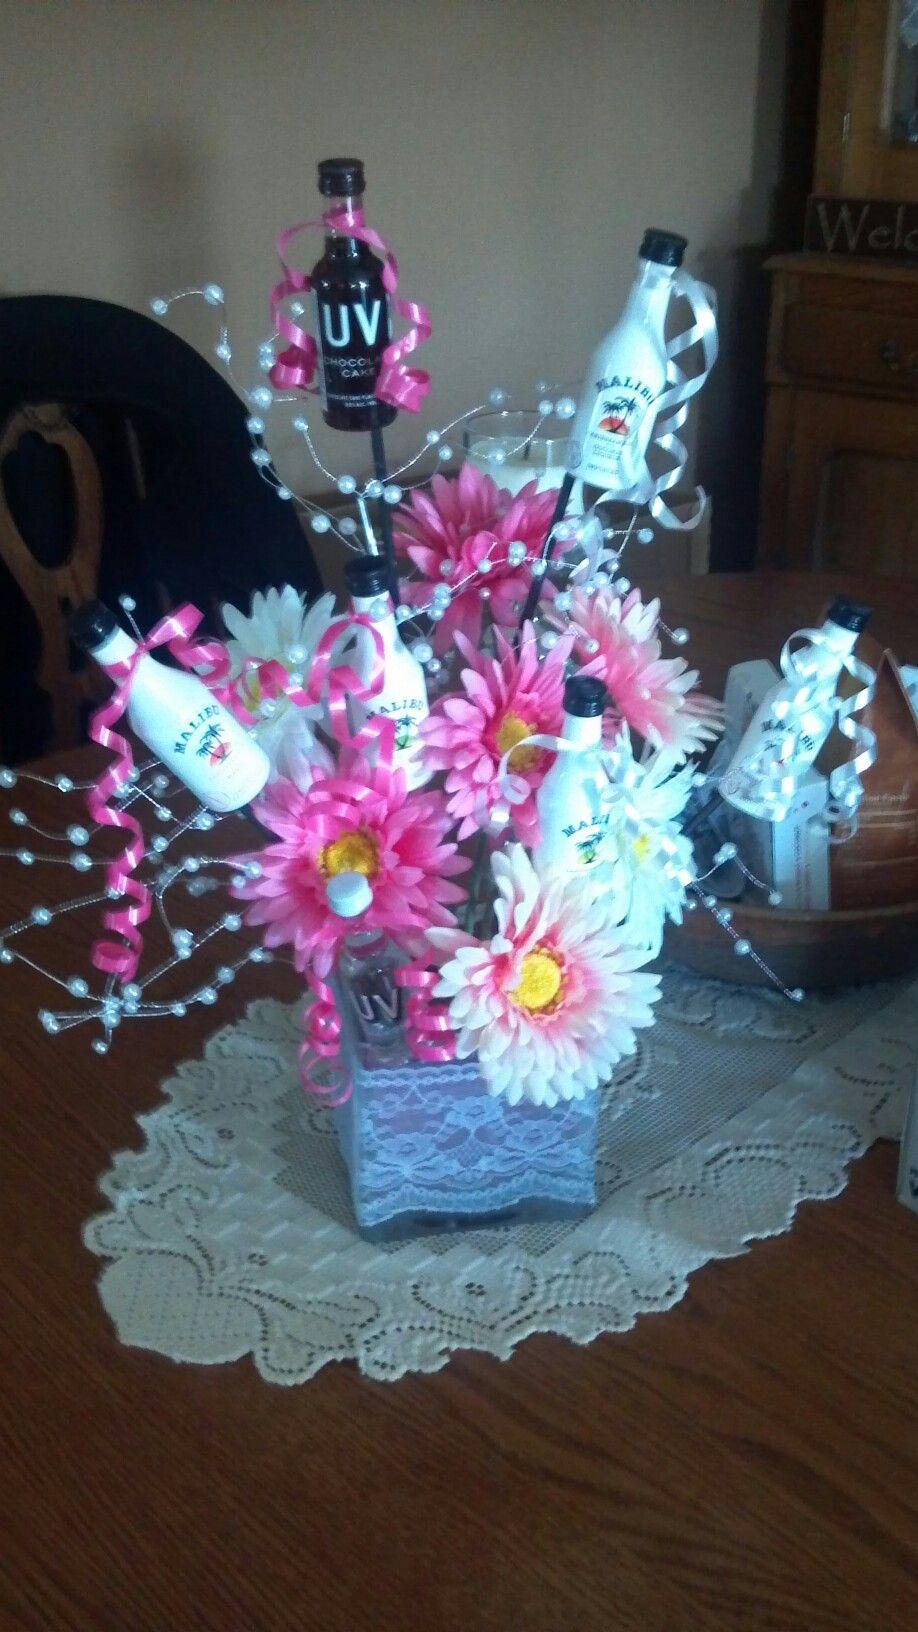 21st birthday gift for a super girly girl !!!!!!!!! 21st